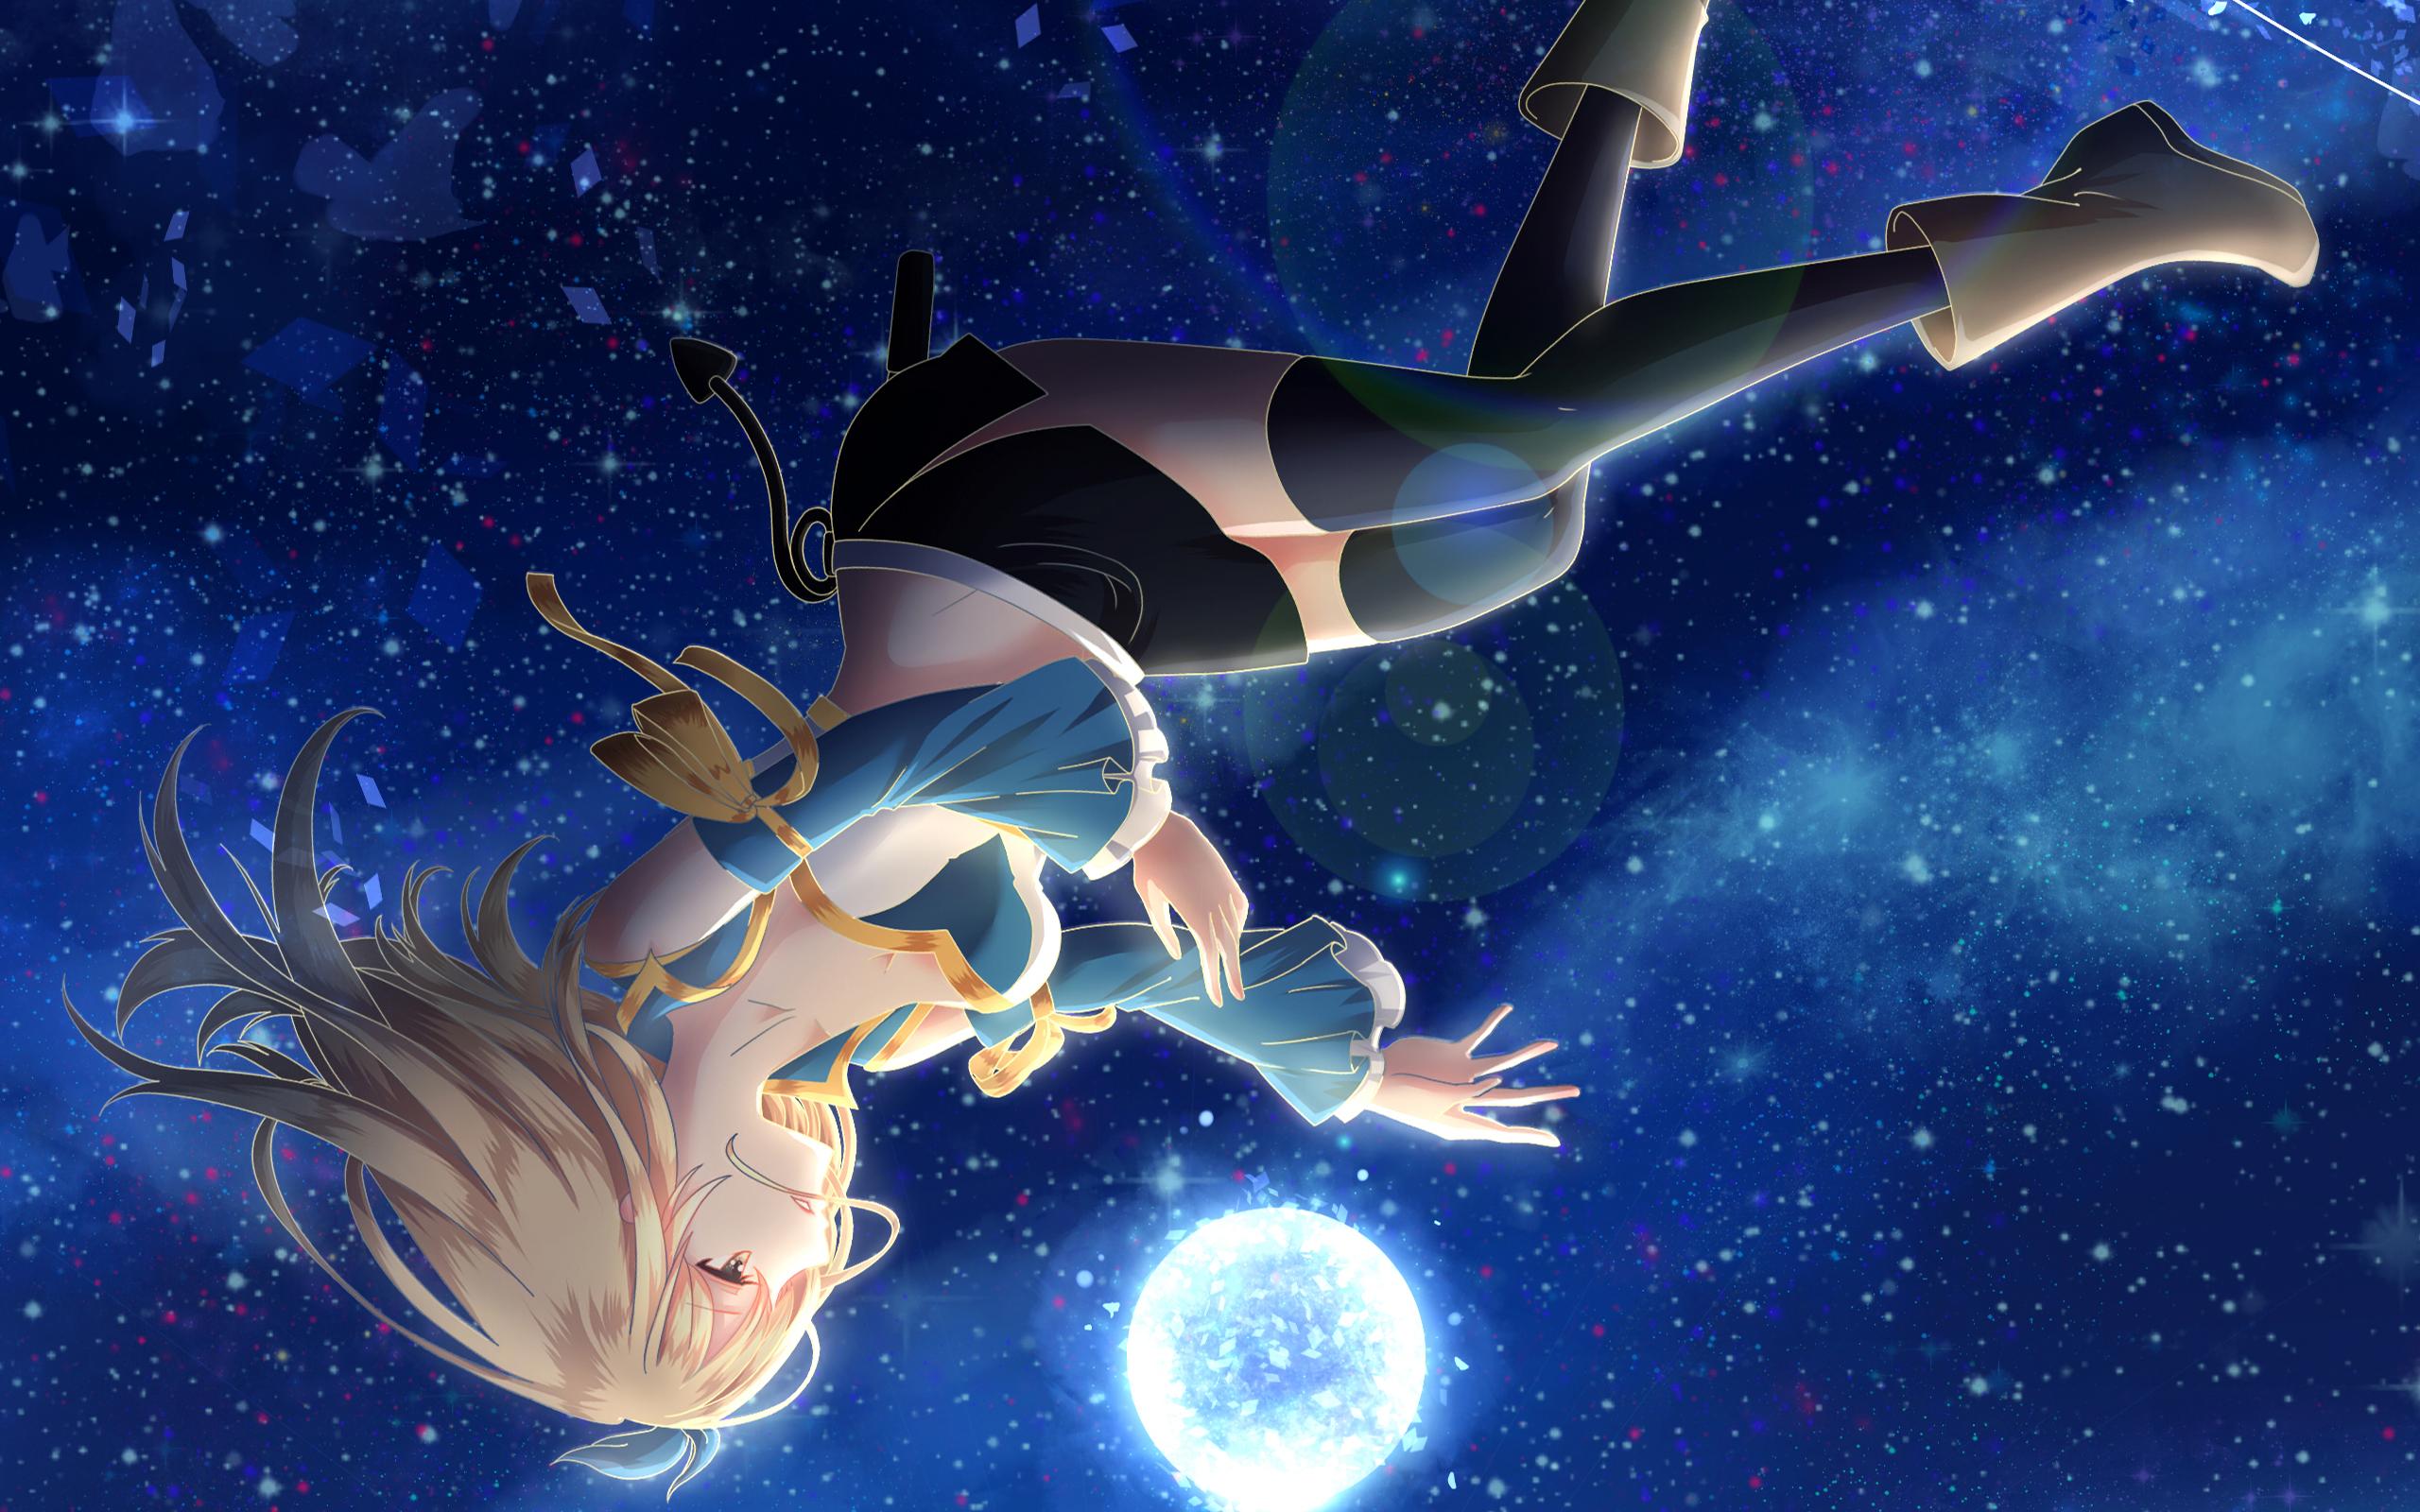 Wallpaper Fairy Tale Fairy Tail Heartfilia Lucy Blonde